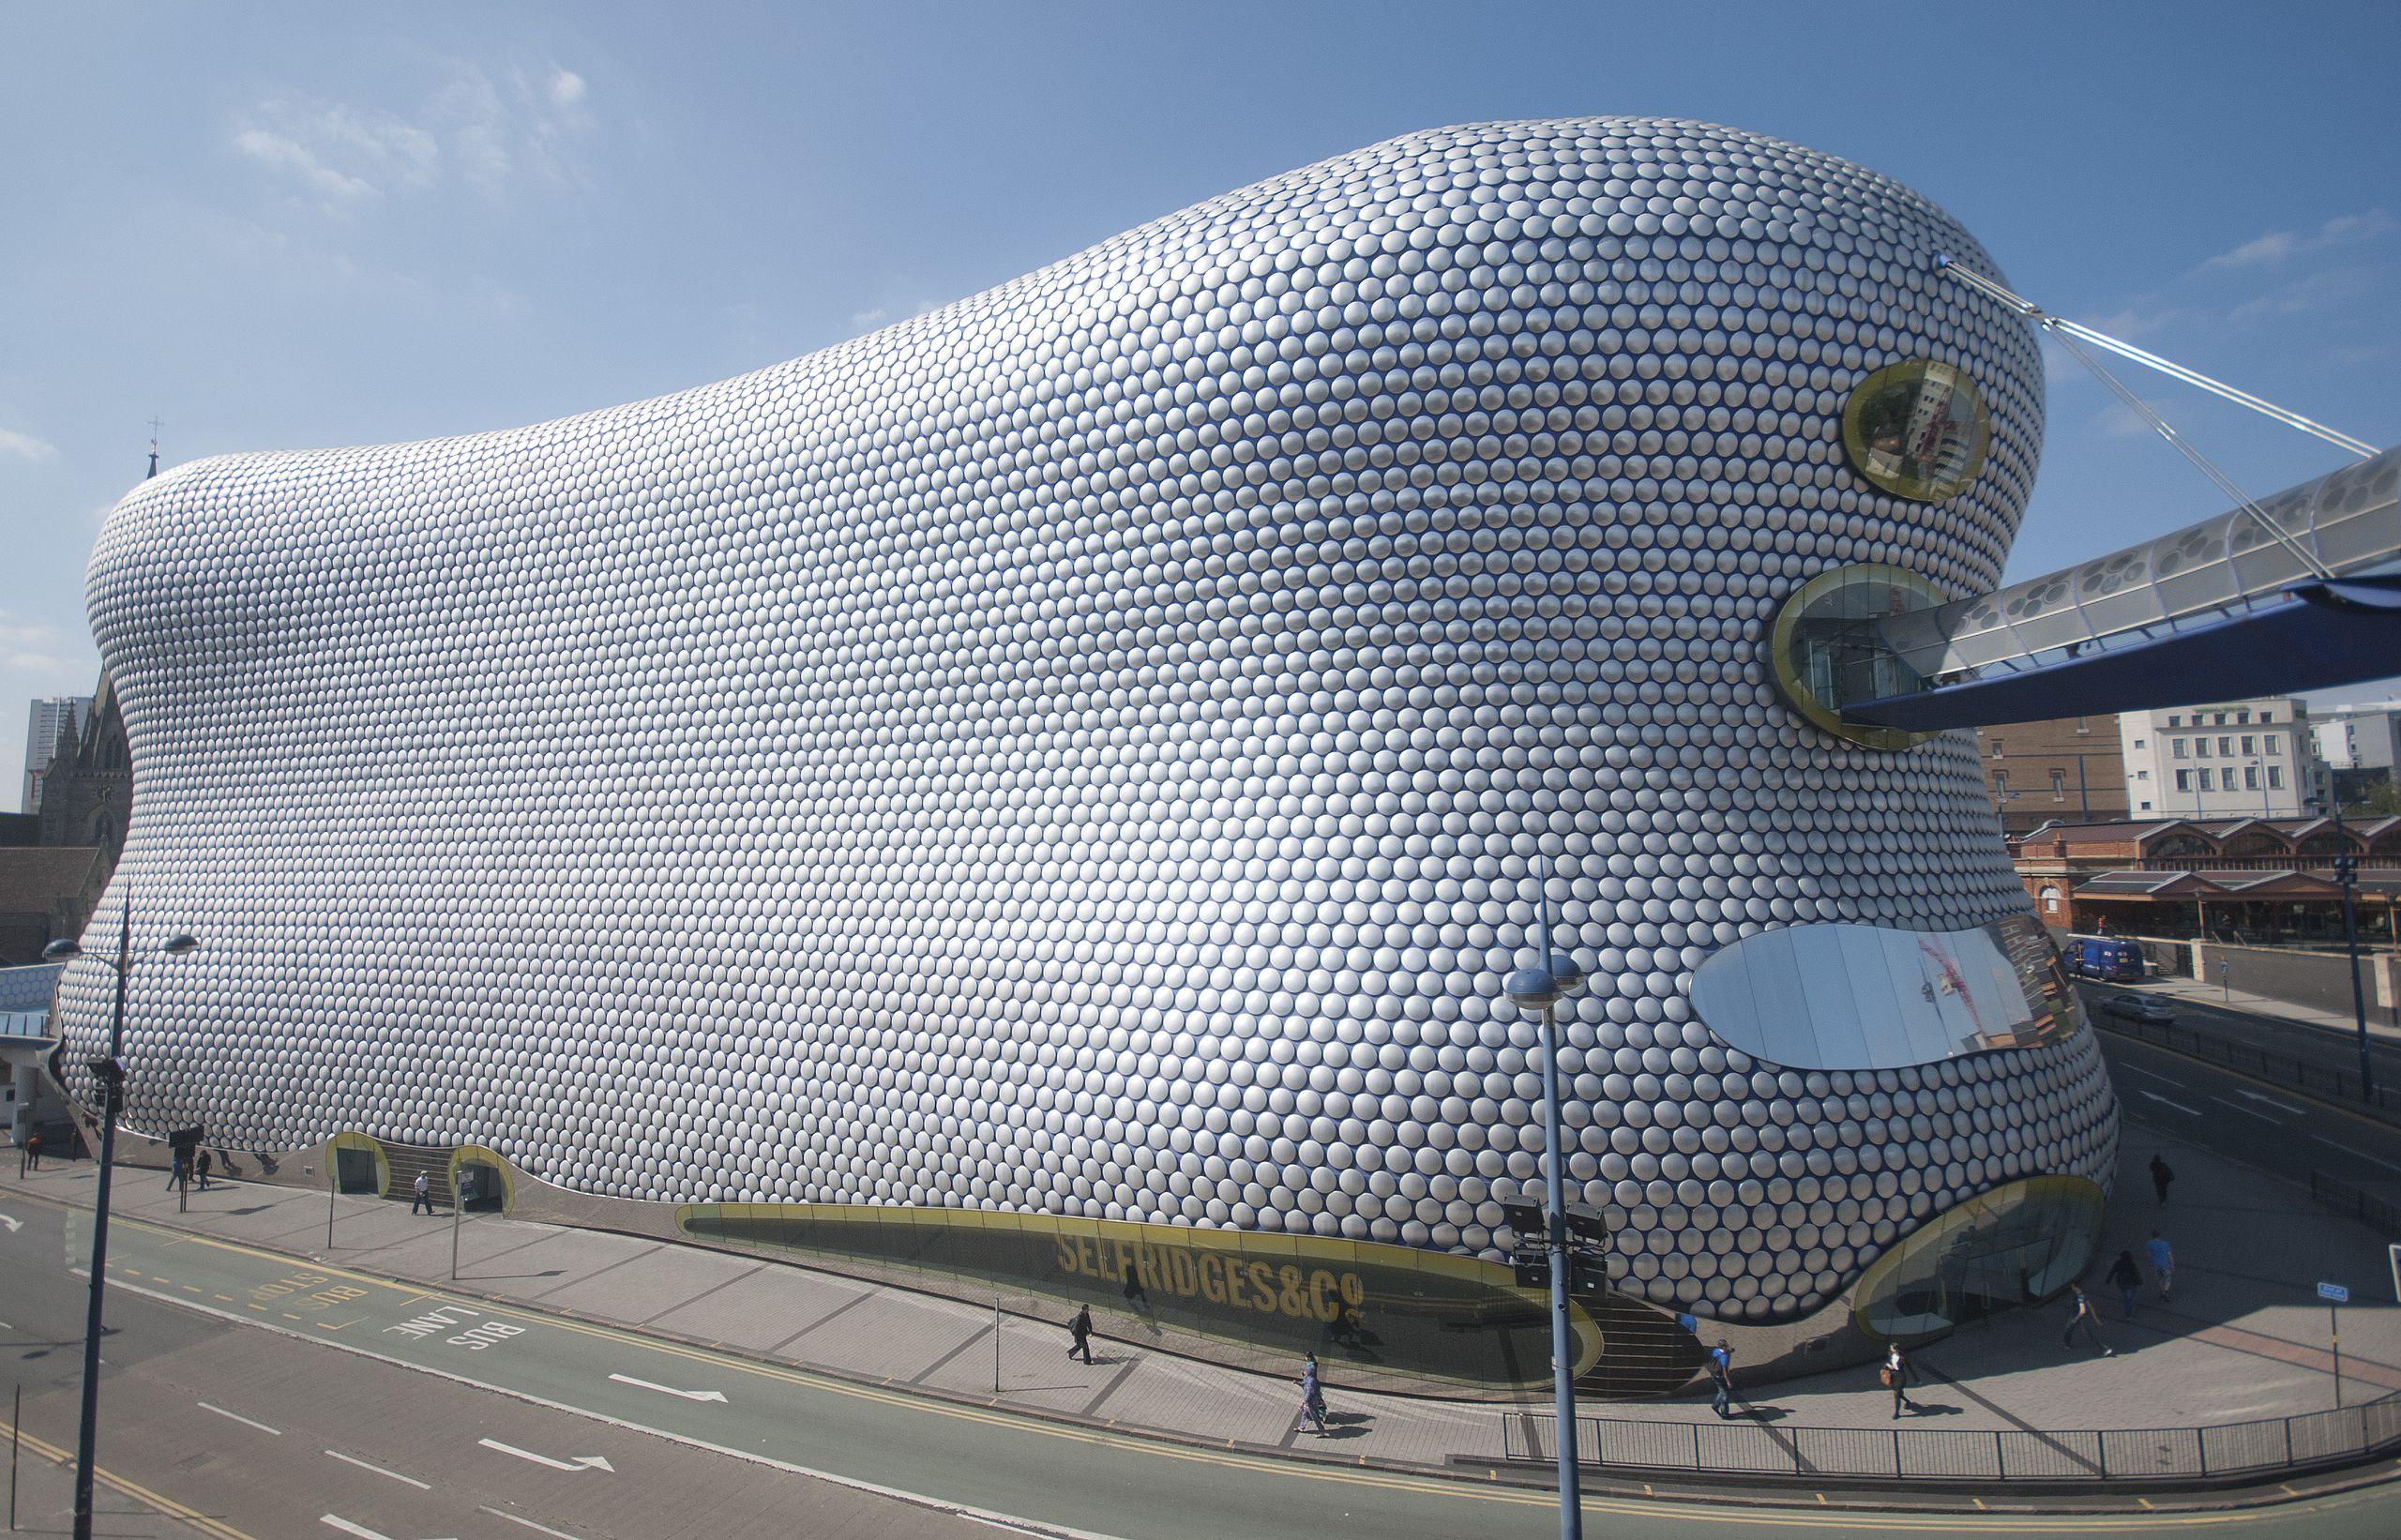 File:Blob Birmingham.jpg - Wikimedia Commons